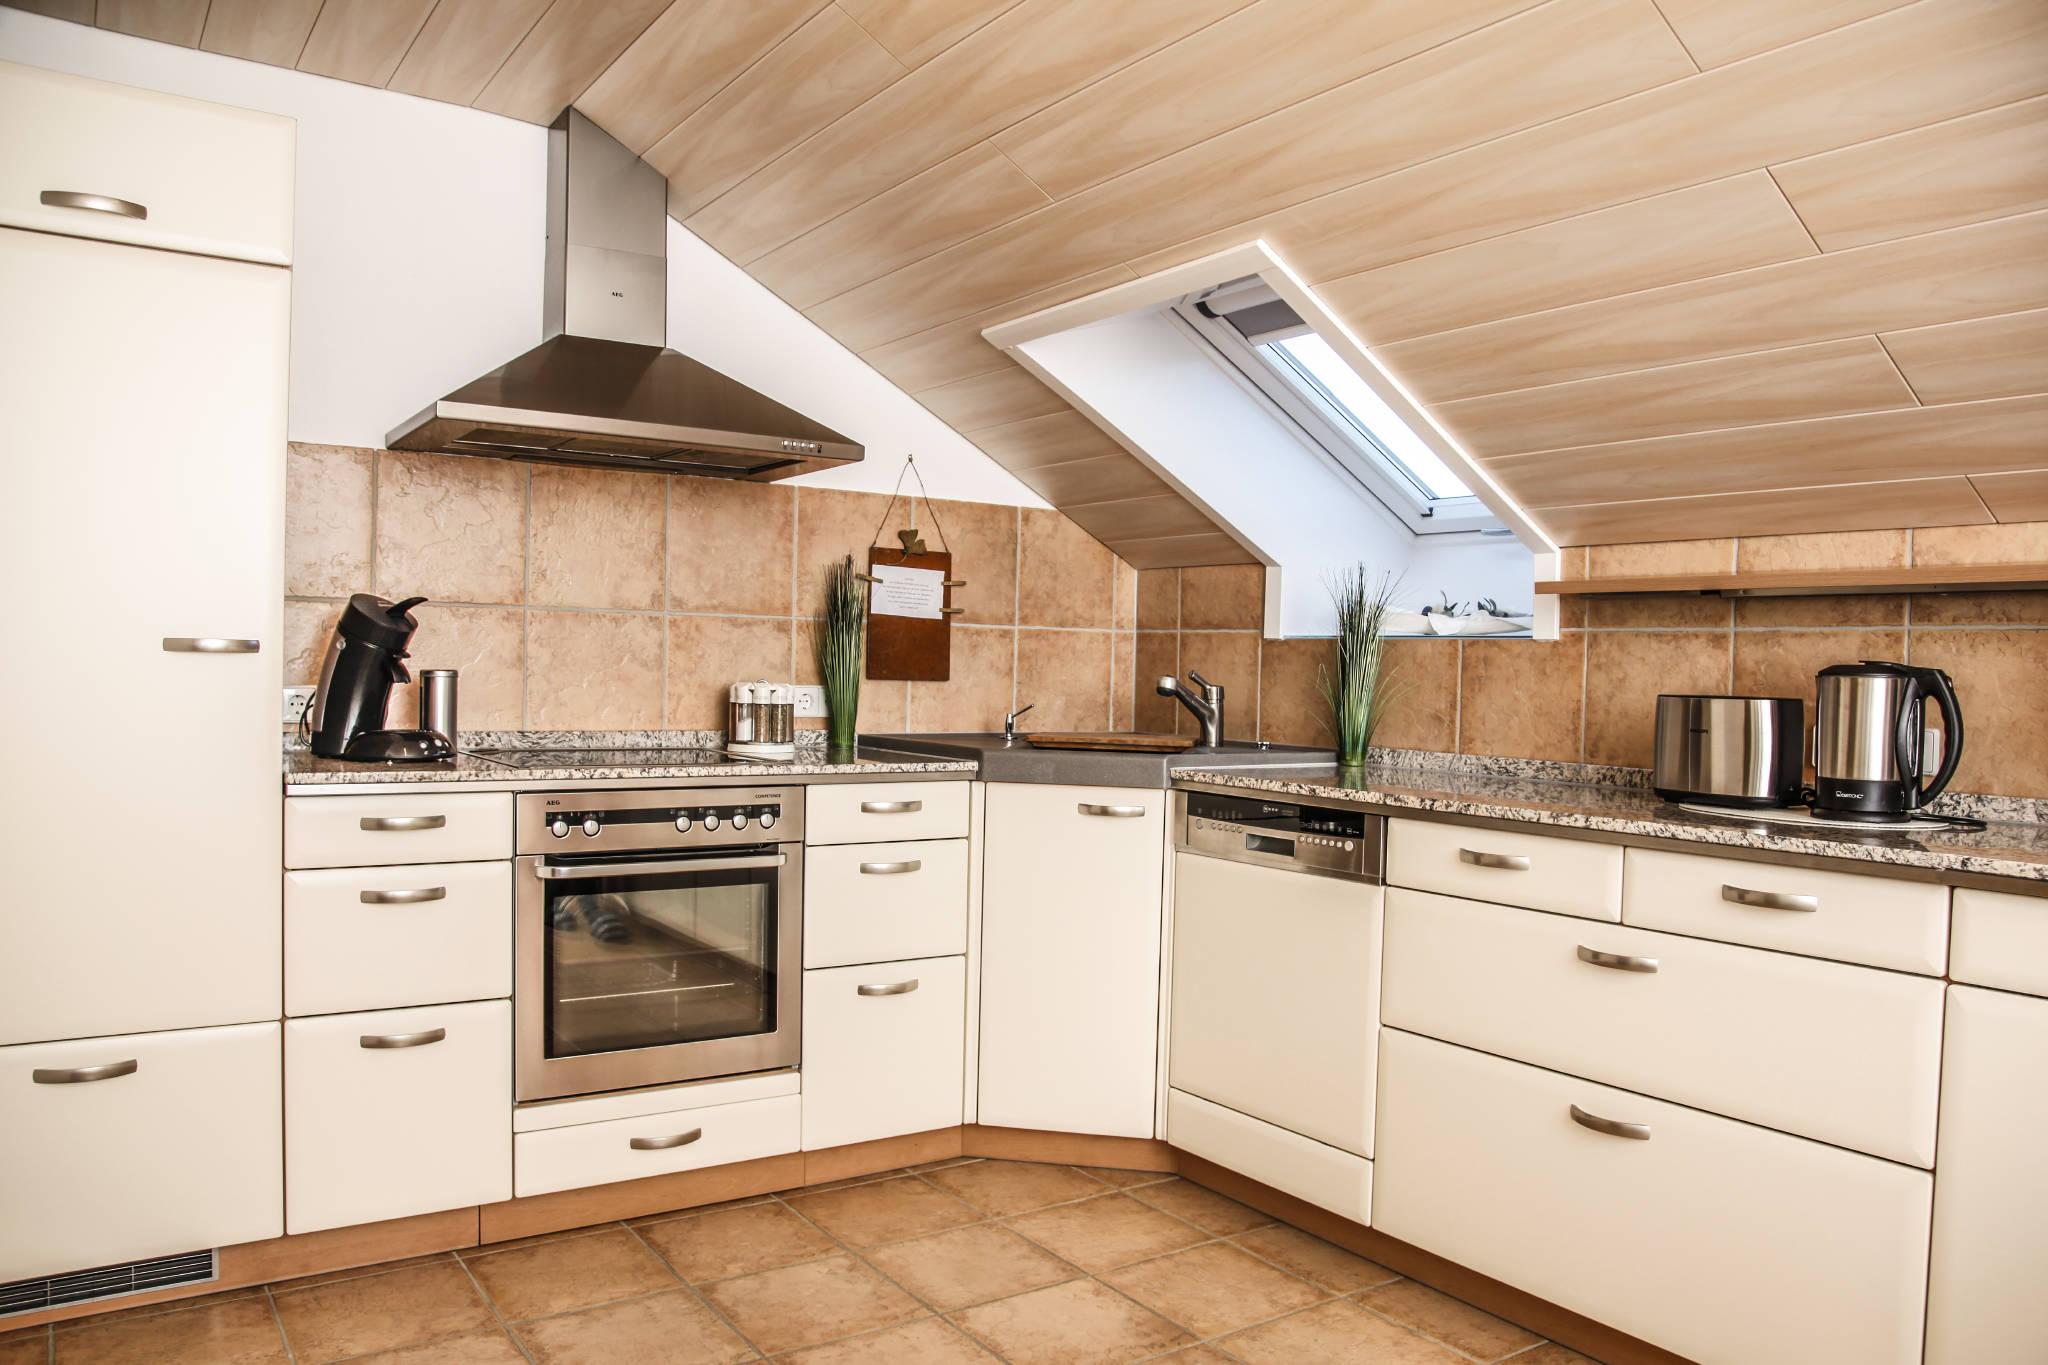 Wunderbare große helle Küche